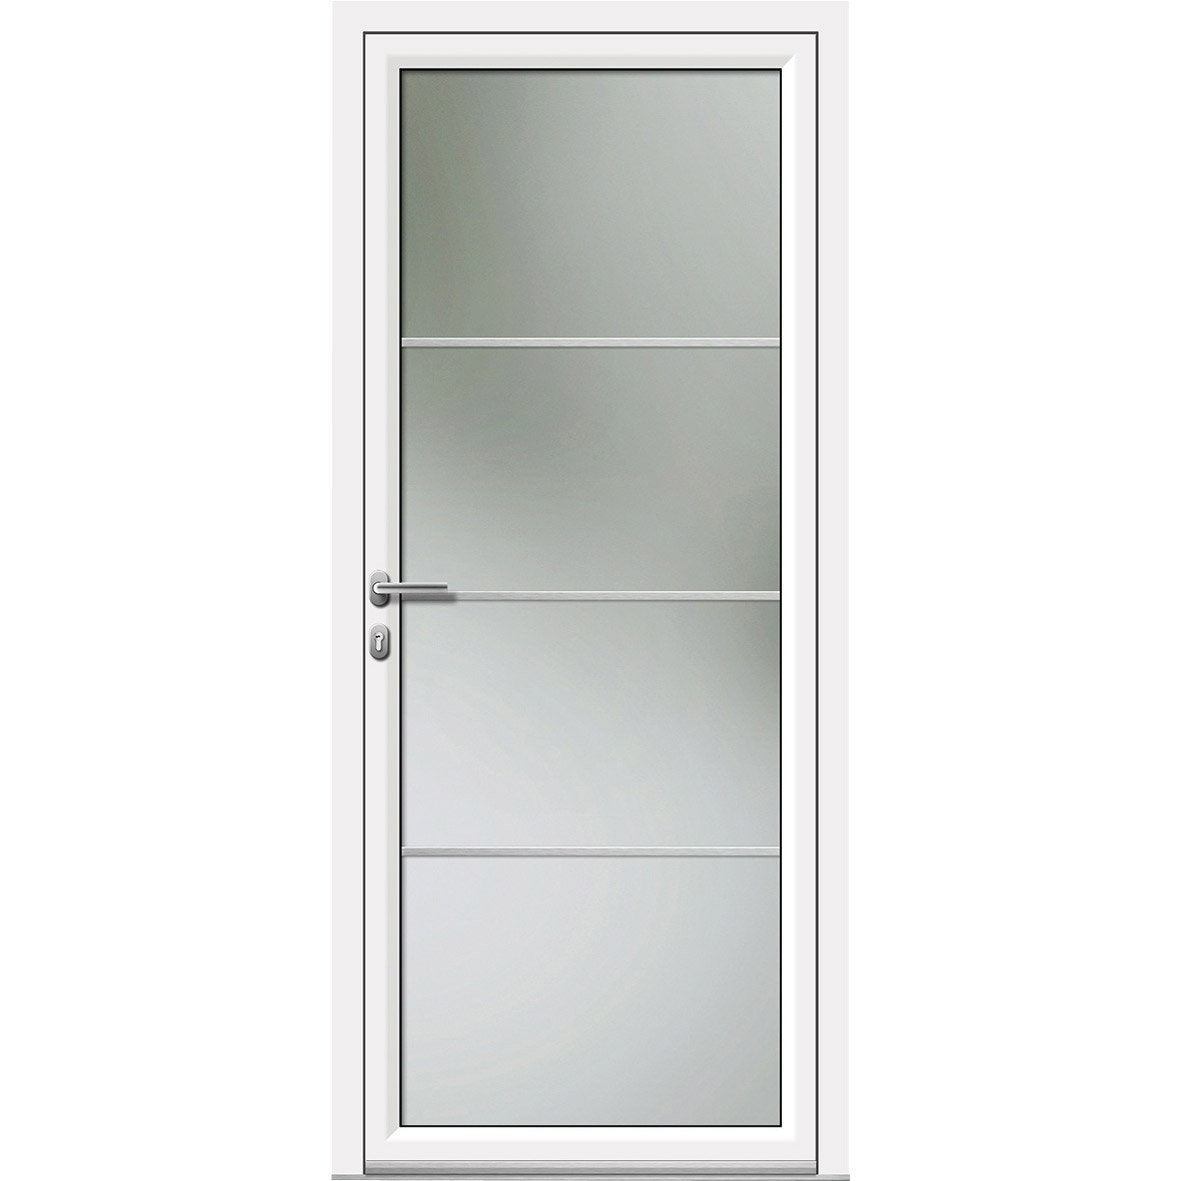 Porte d 39 entr e sur mesure en aluminium laly artens leroy - Leroy merlin porte vitree ...